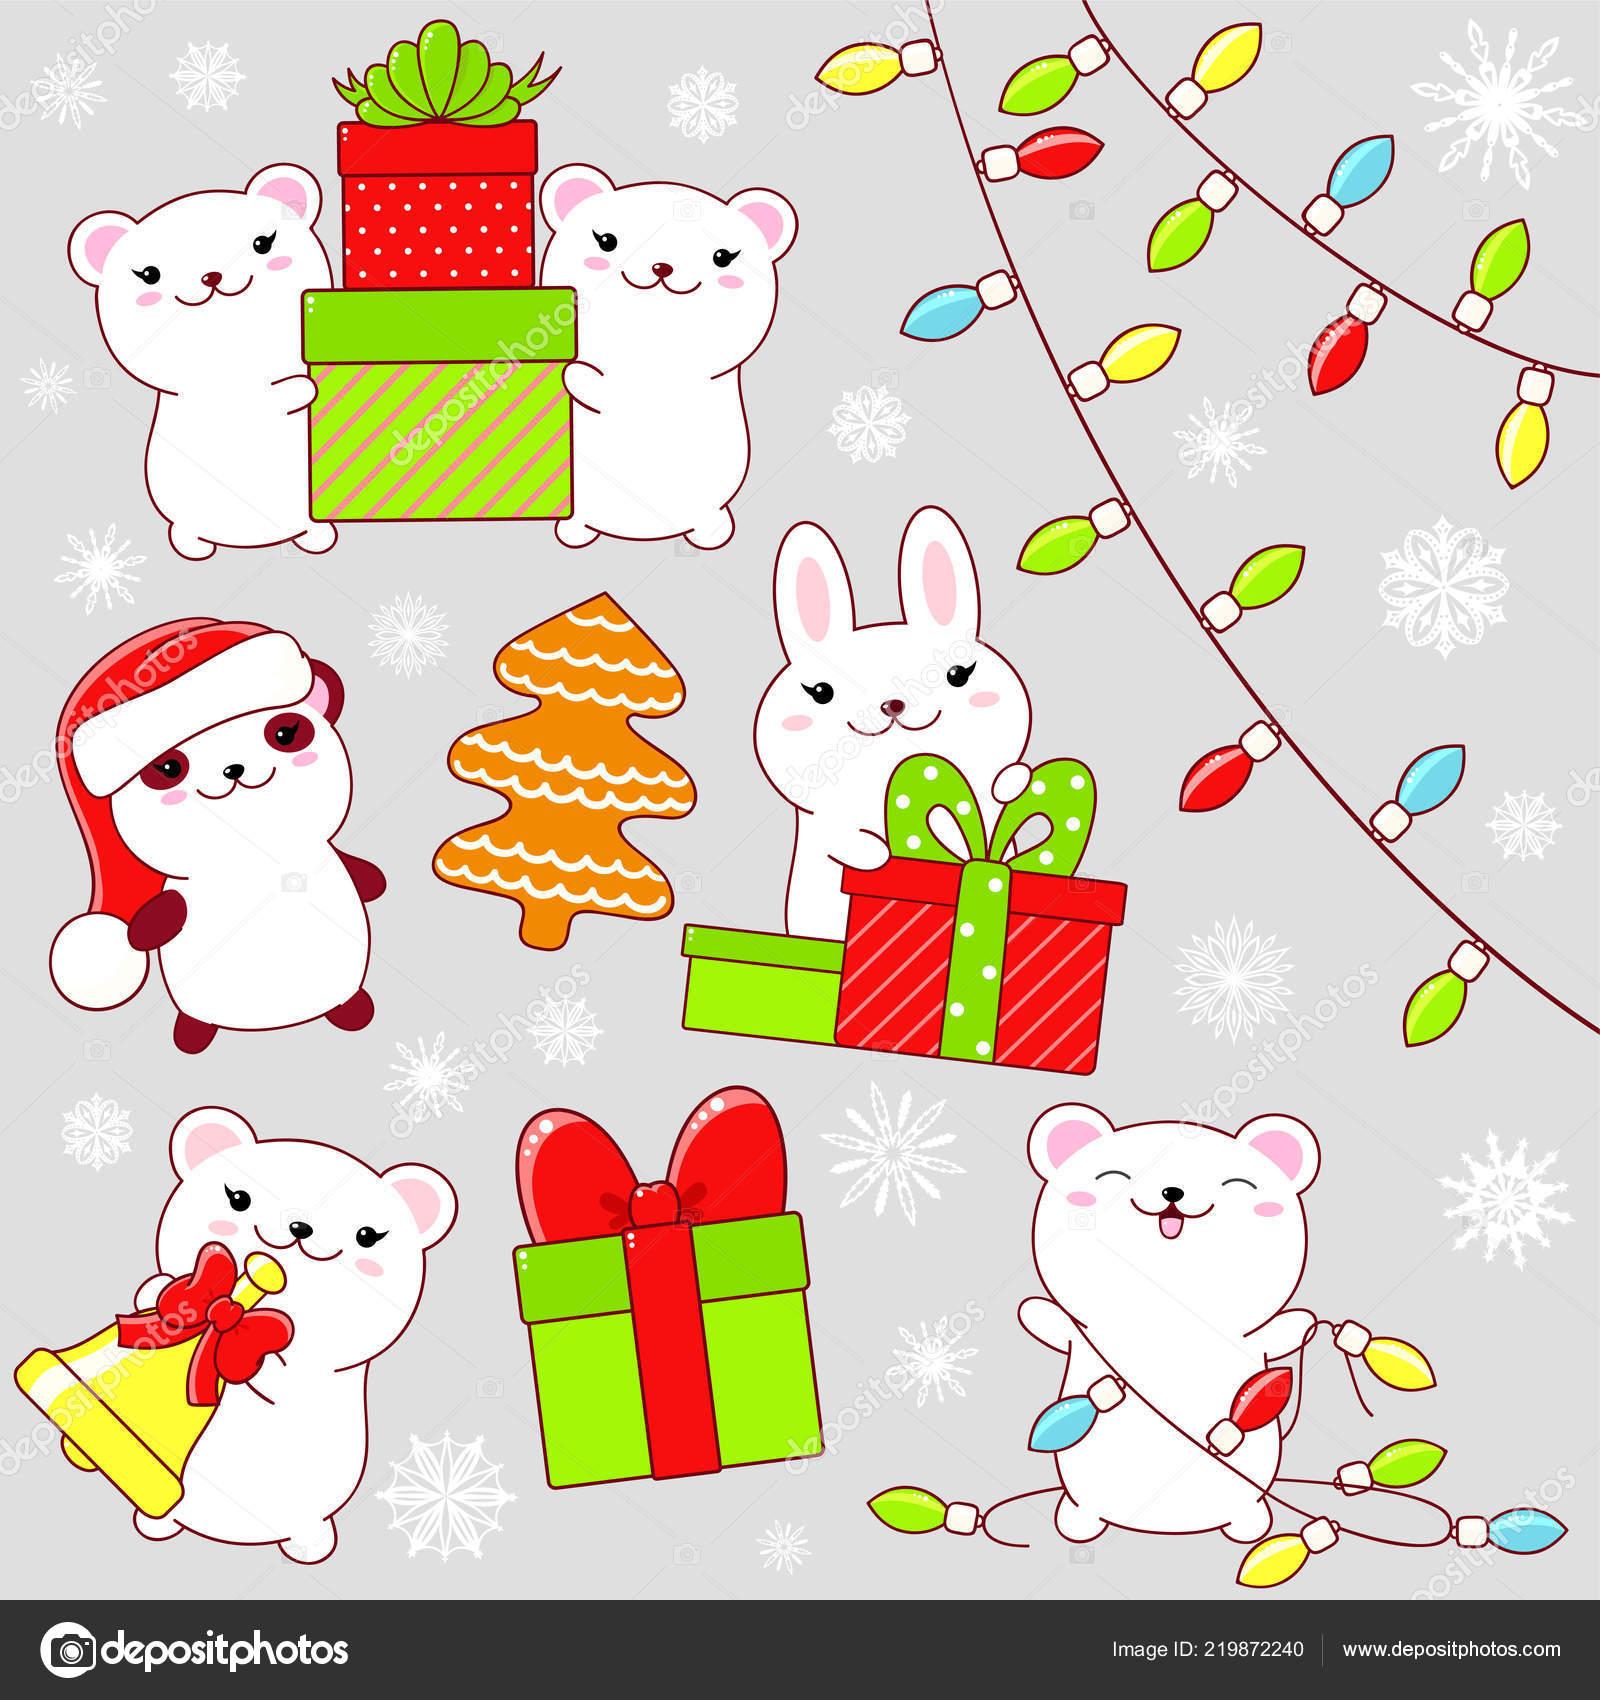 Immagini Carine Natale.Set Icone Natale Carine Stile Kawaii Coniglio Orso Polare